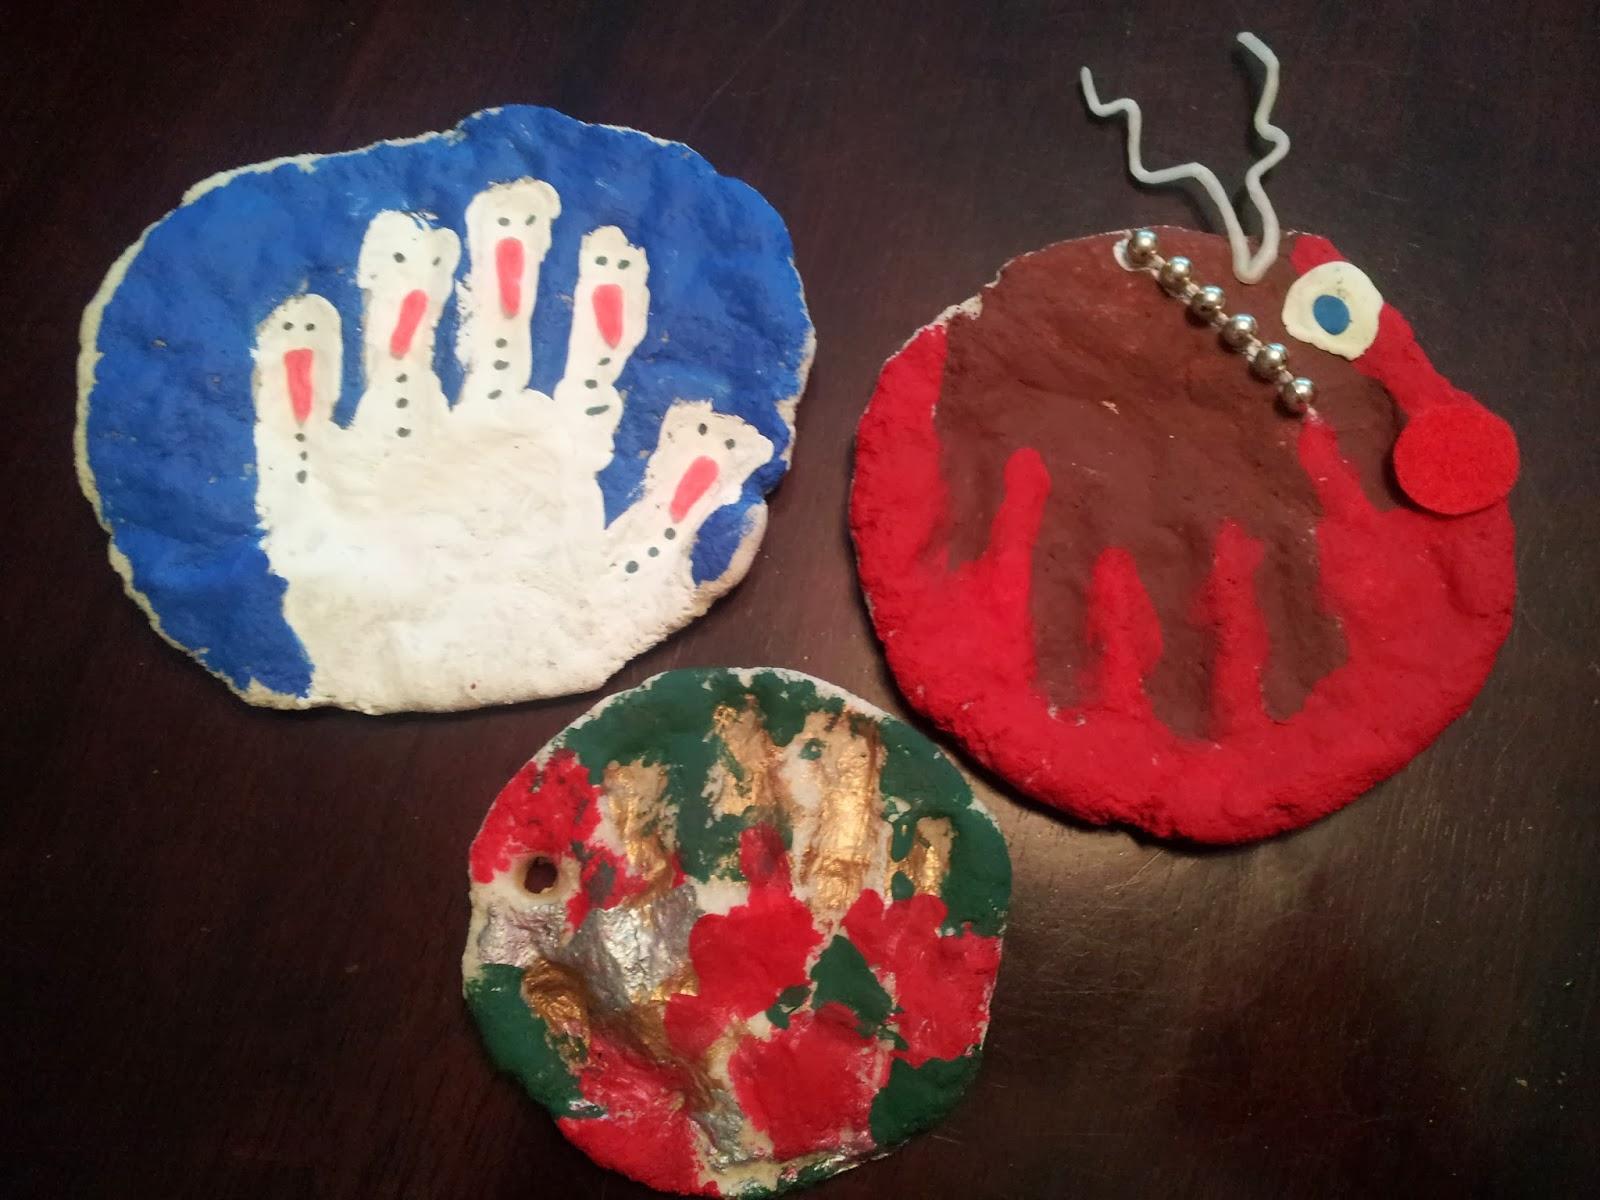 Salt Dough Christmas Ornaments, crafts, kids crafts